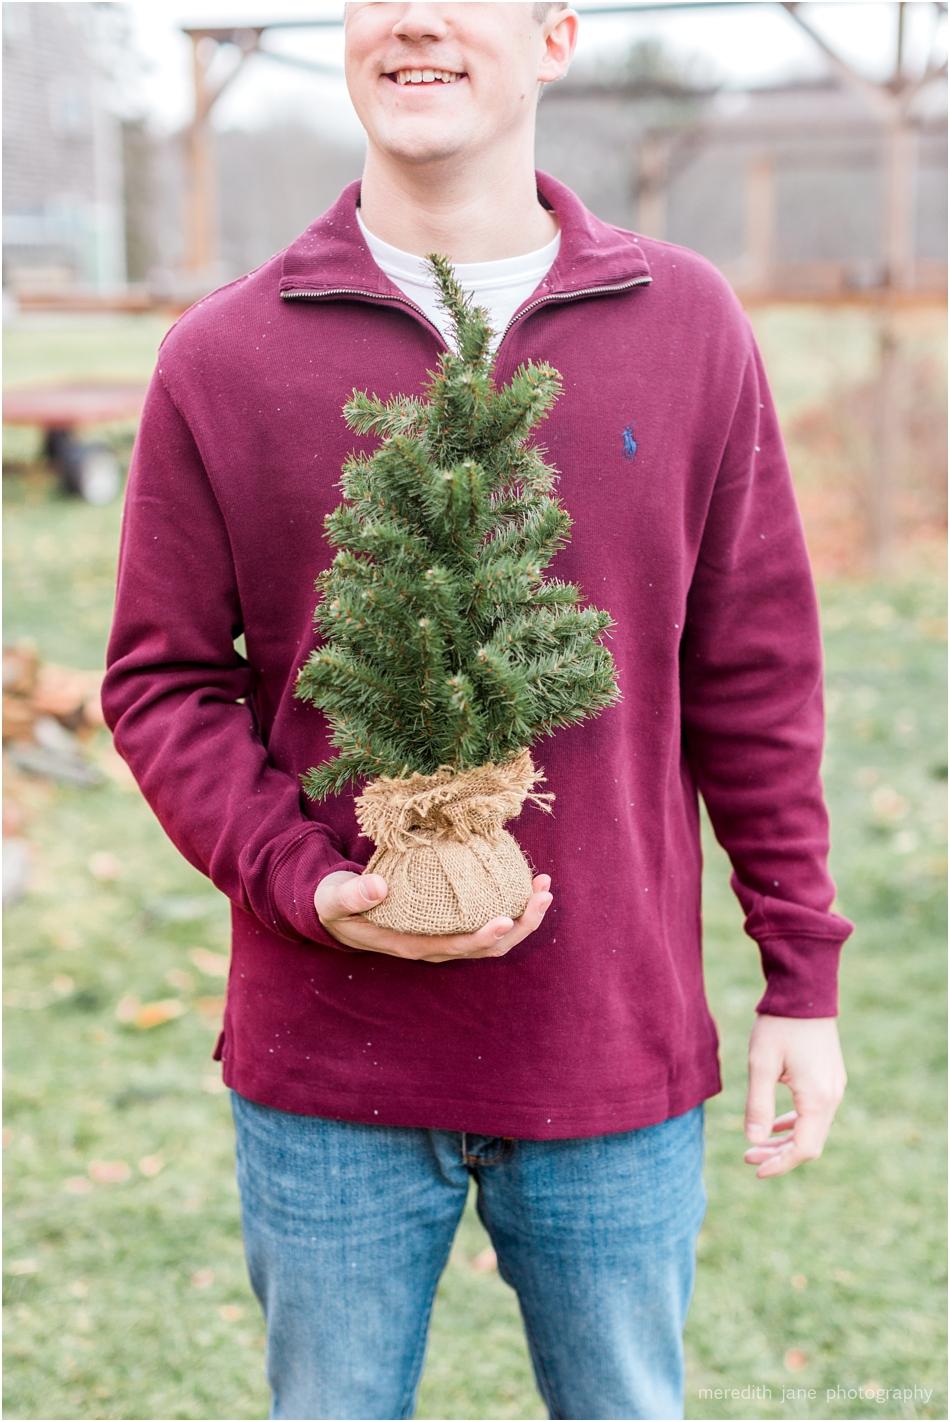 mistletoe_holiday_tree_farm_christmas_boston_massachusetts_engagement_fall_cape_cod_wedding_photographer_Meredith_Jane_Photography_photo_1014.jpg